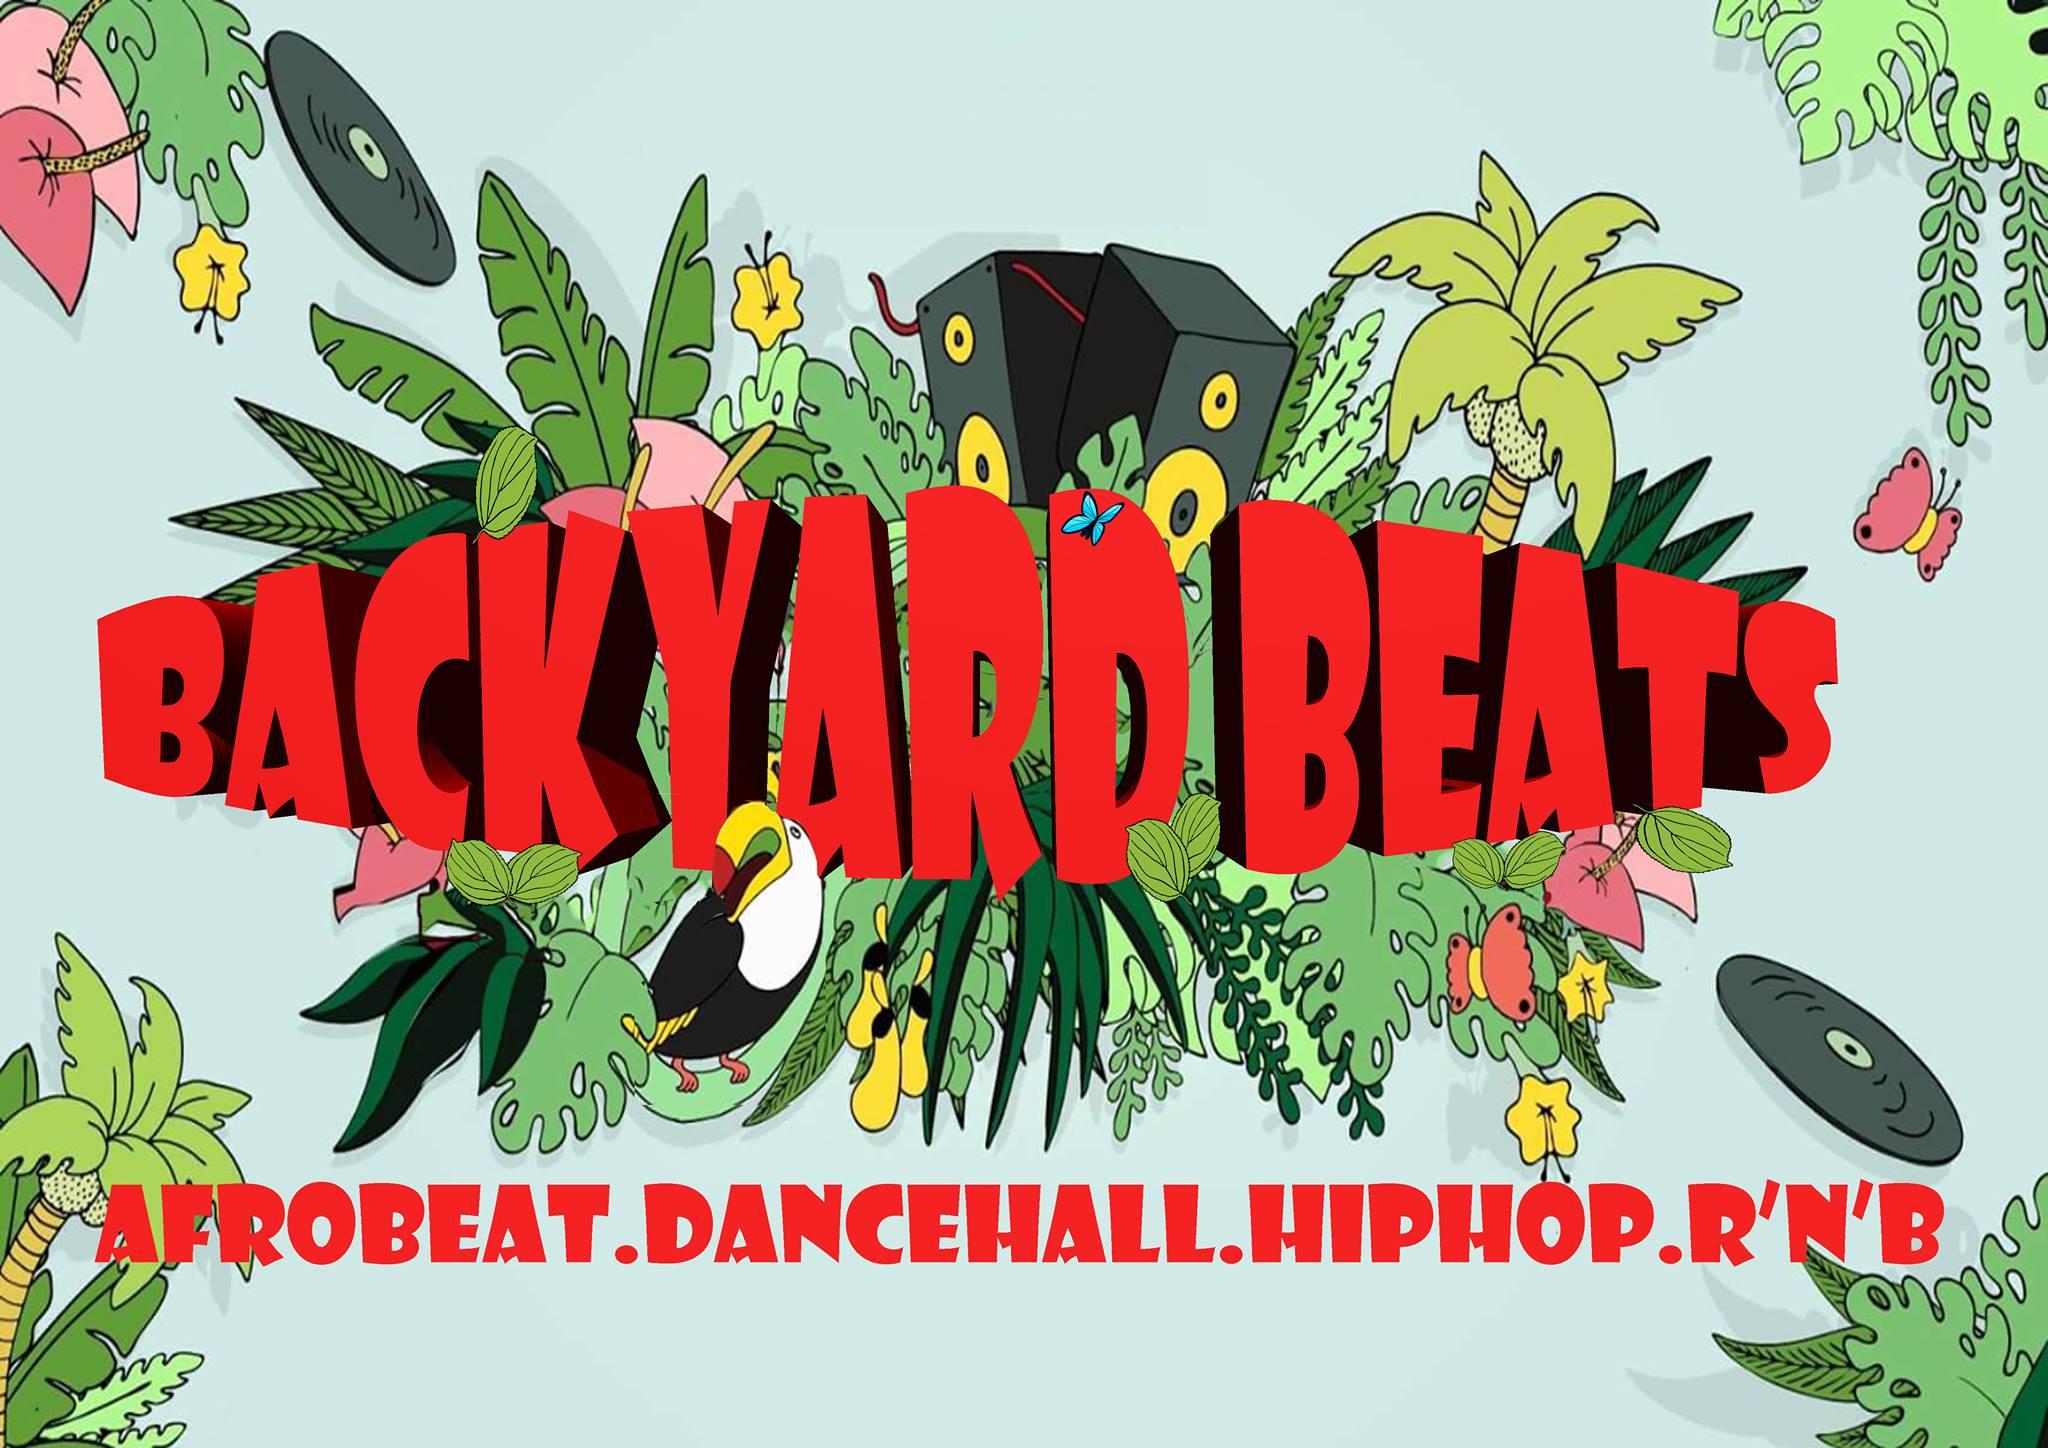 Evenemang: Back a yard Beats with DJ Sonic Madagascar at Hilma Stockholm